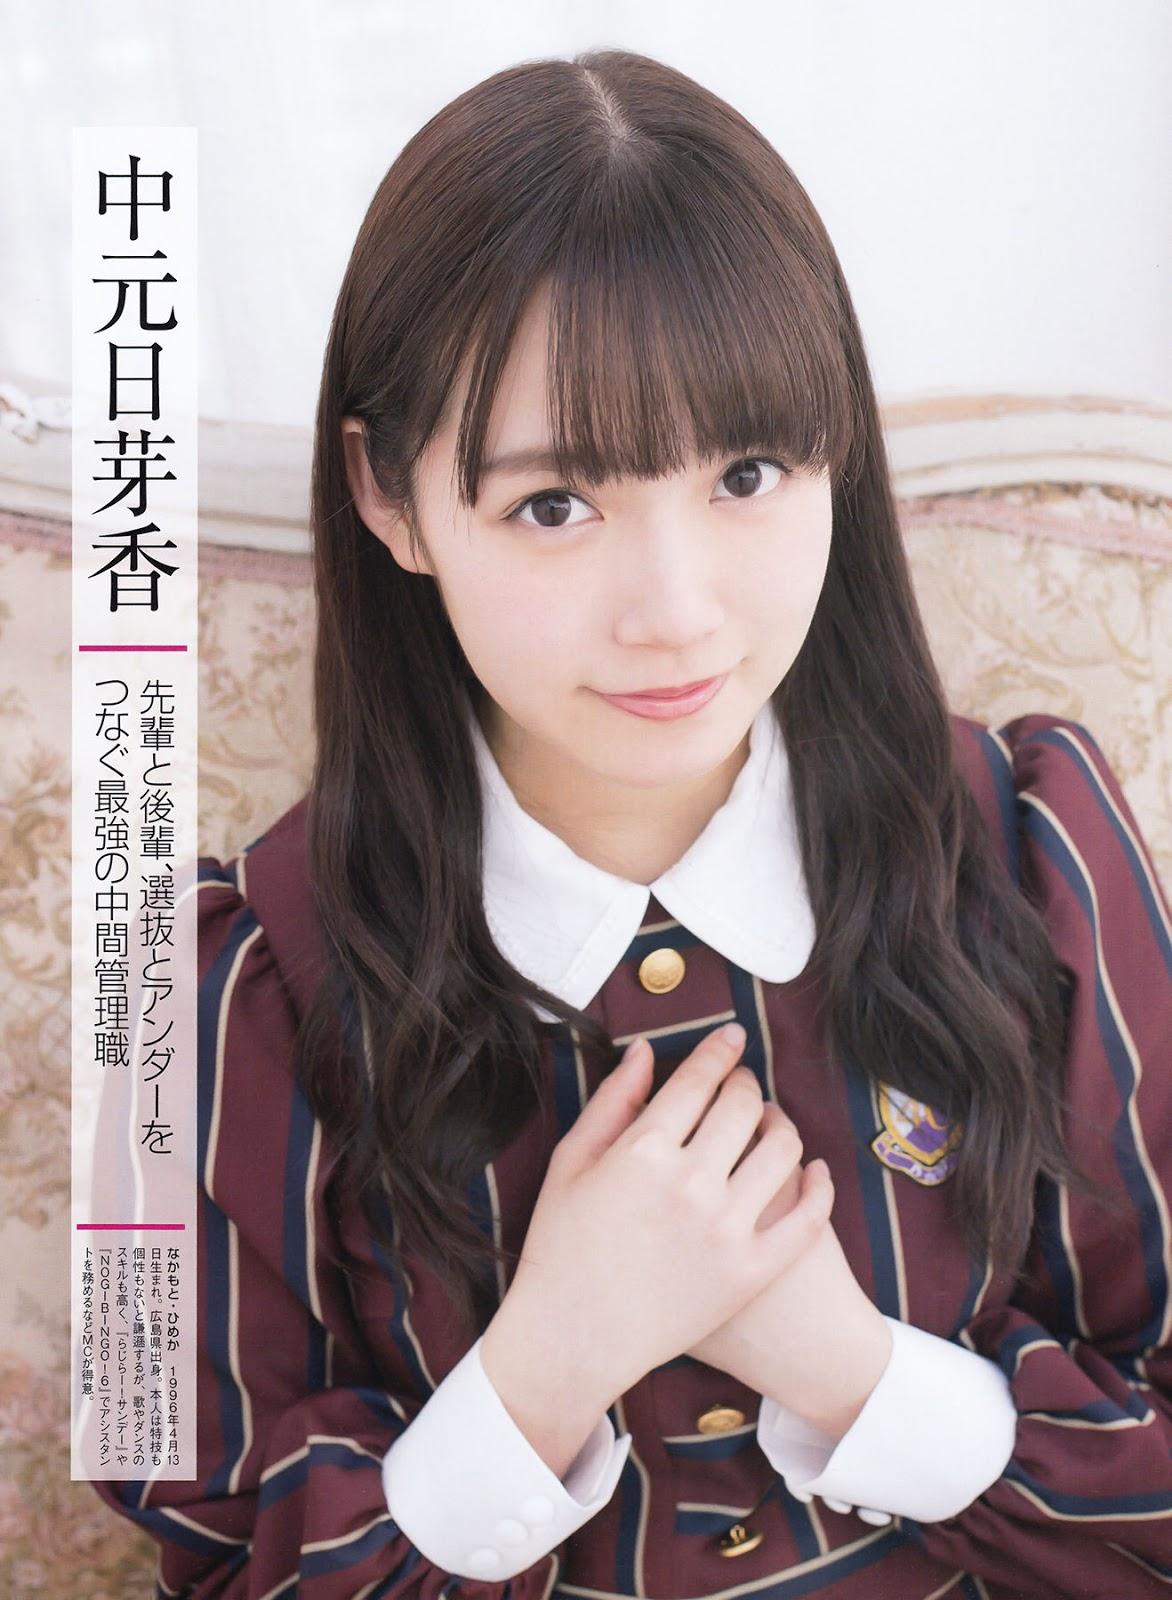 Nogizaka46, Nikkei Entertainment! IDOL Special 2017 (日経エンタテインメント! アイドル Special 2017)